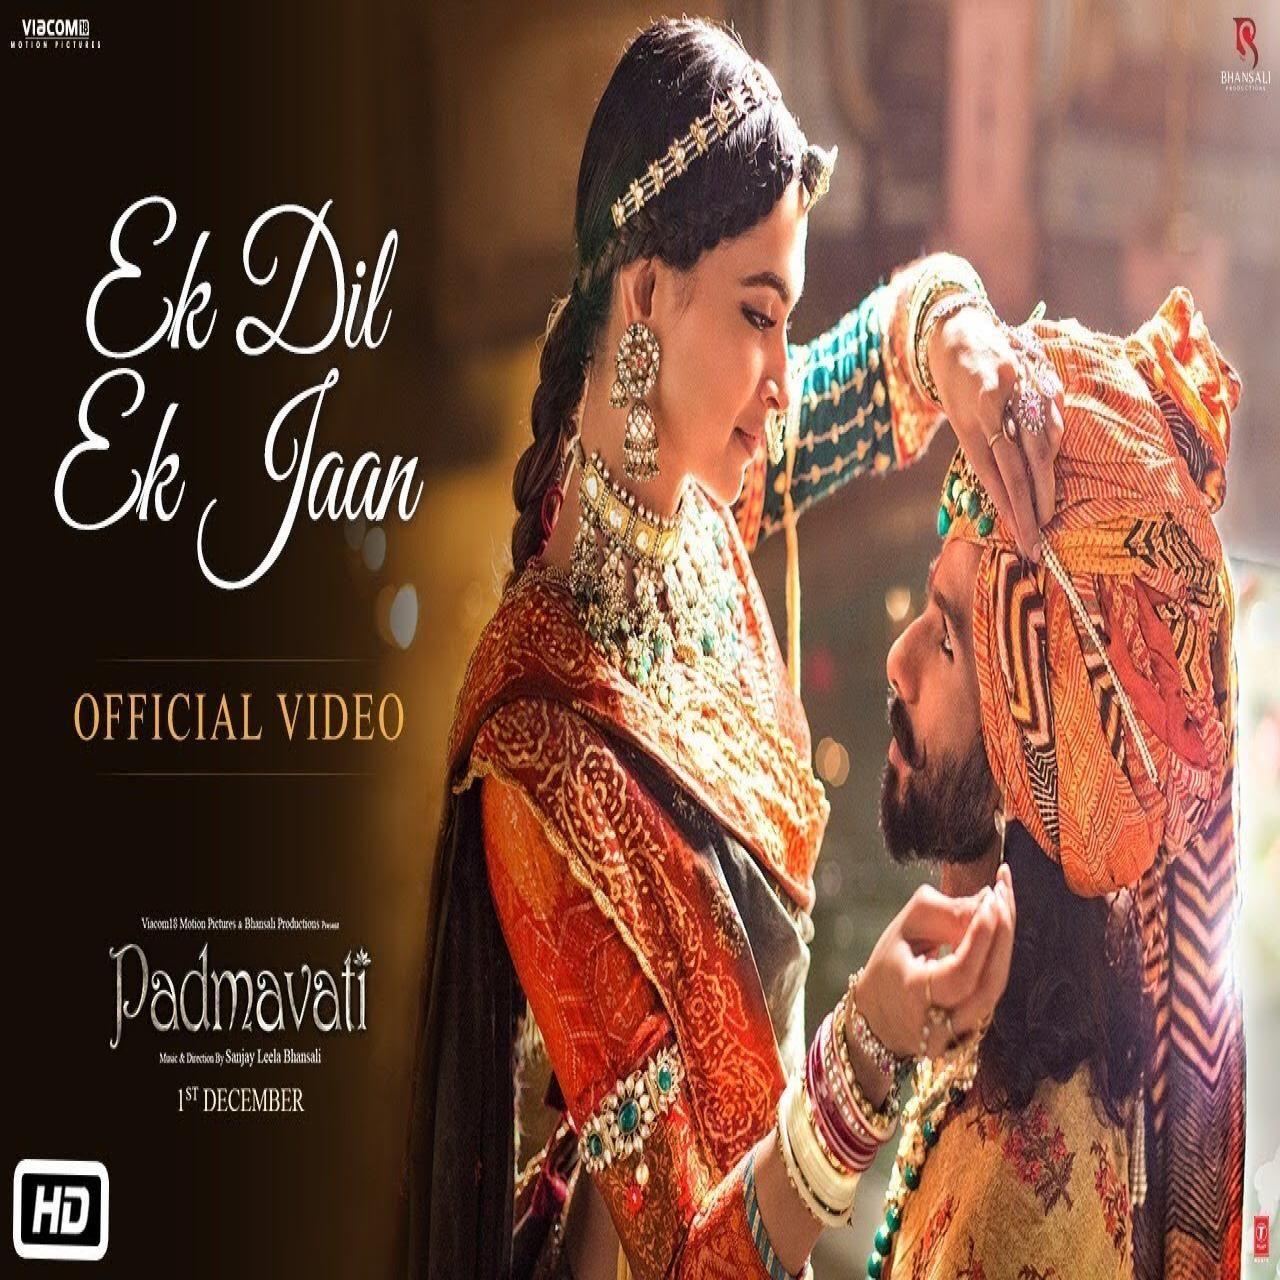 Ek Dil Ek Jaan (Padmavati) | Download in 2019 | Bollywood music